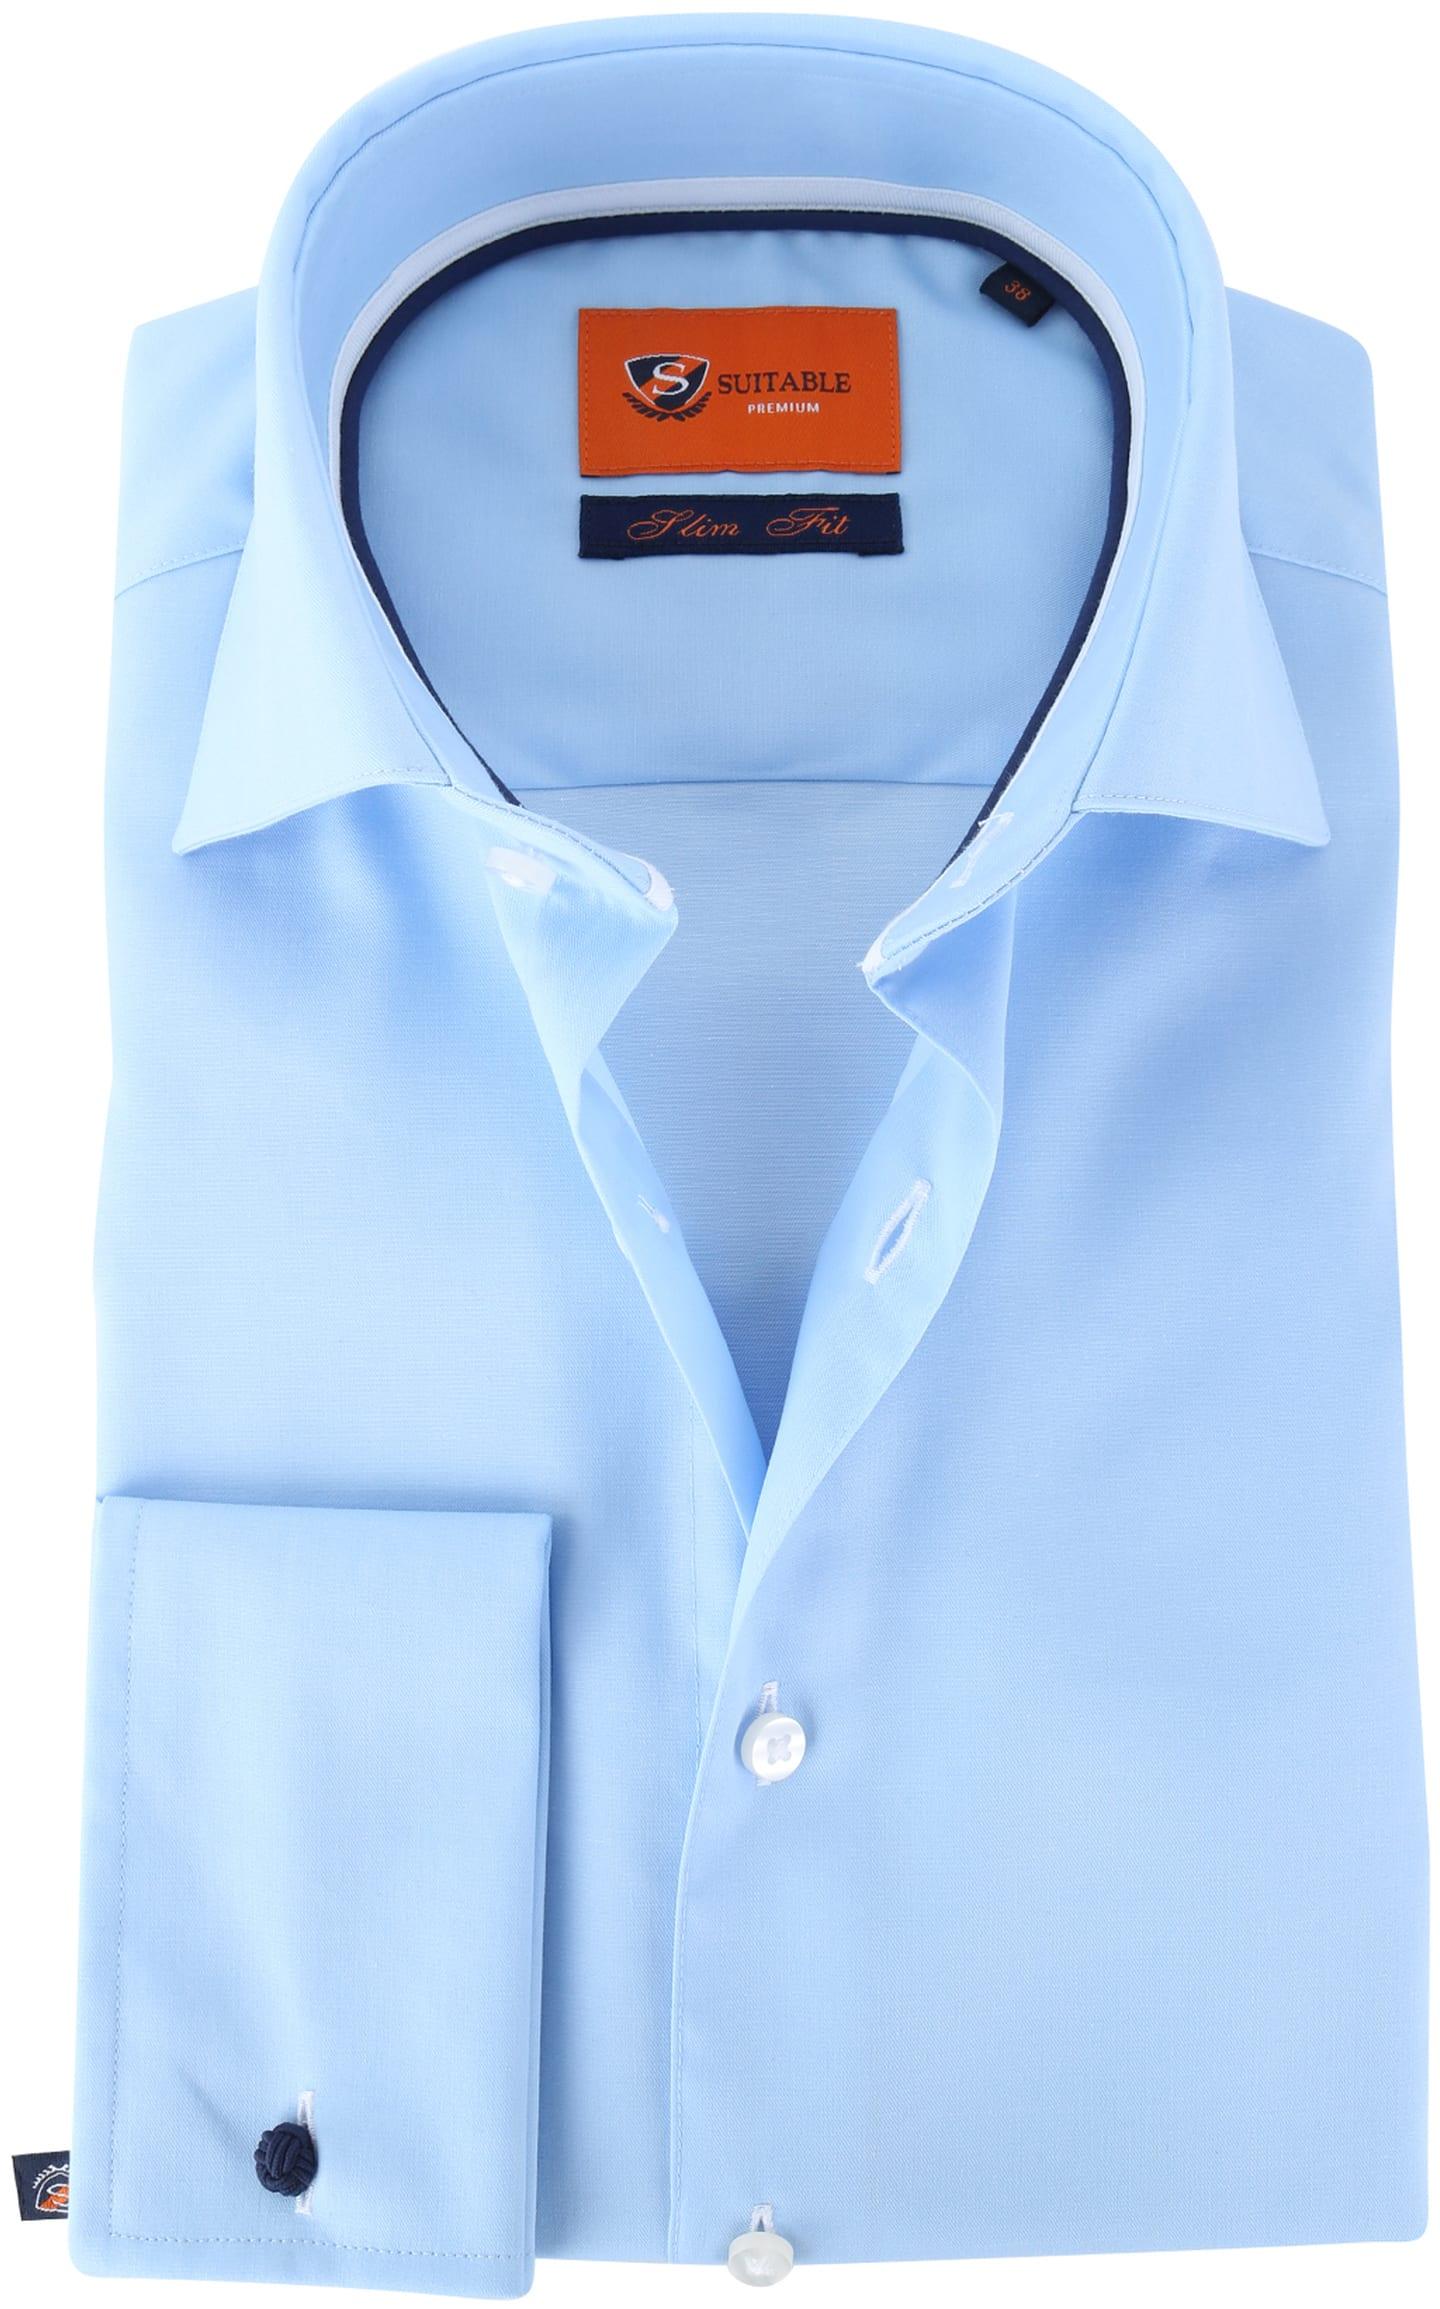 Suitable Overhemd Twill Blue Dubbelmanchet foto 0